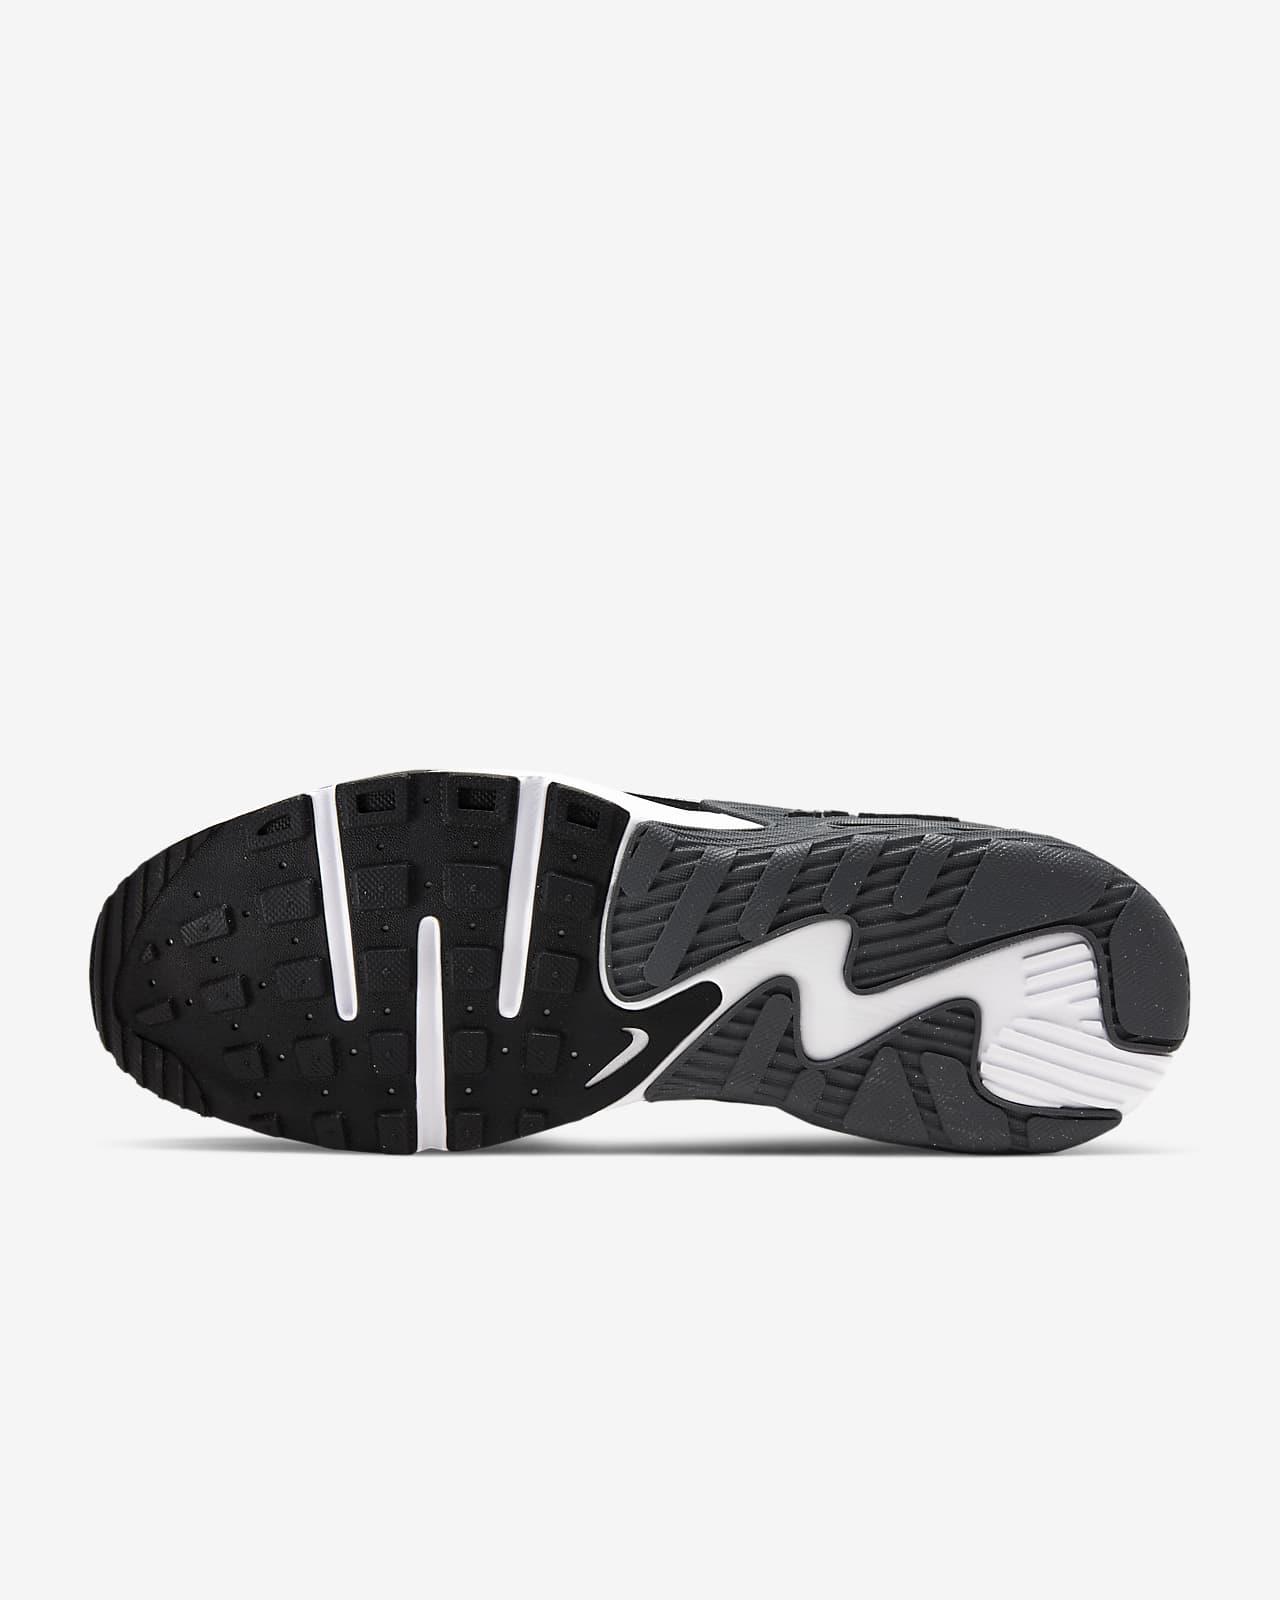 clima solo la licenciatura  Calzado para hombre Nike Air Max Excee. Nike.com